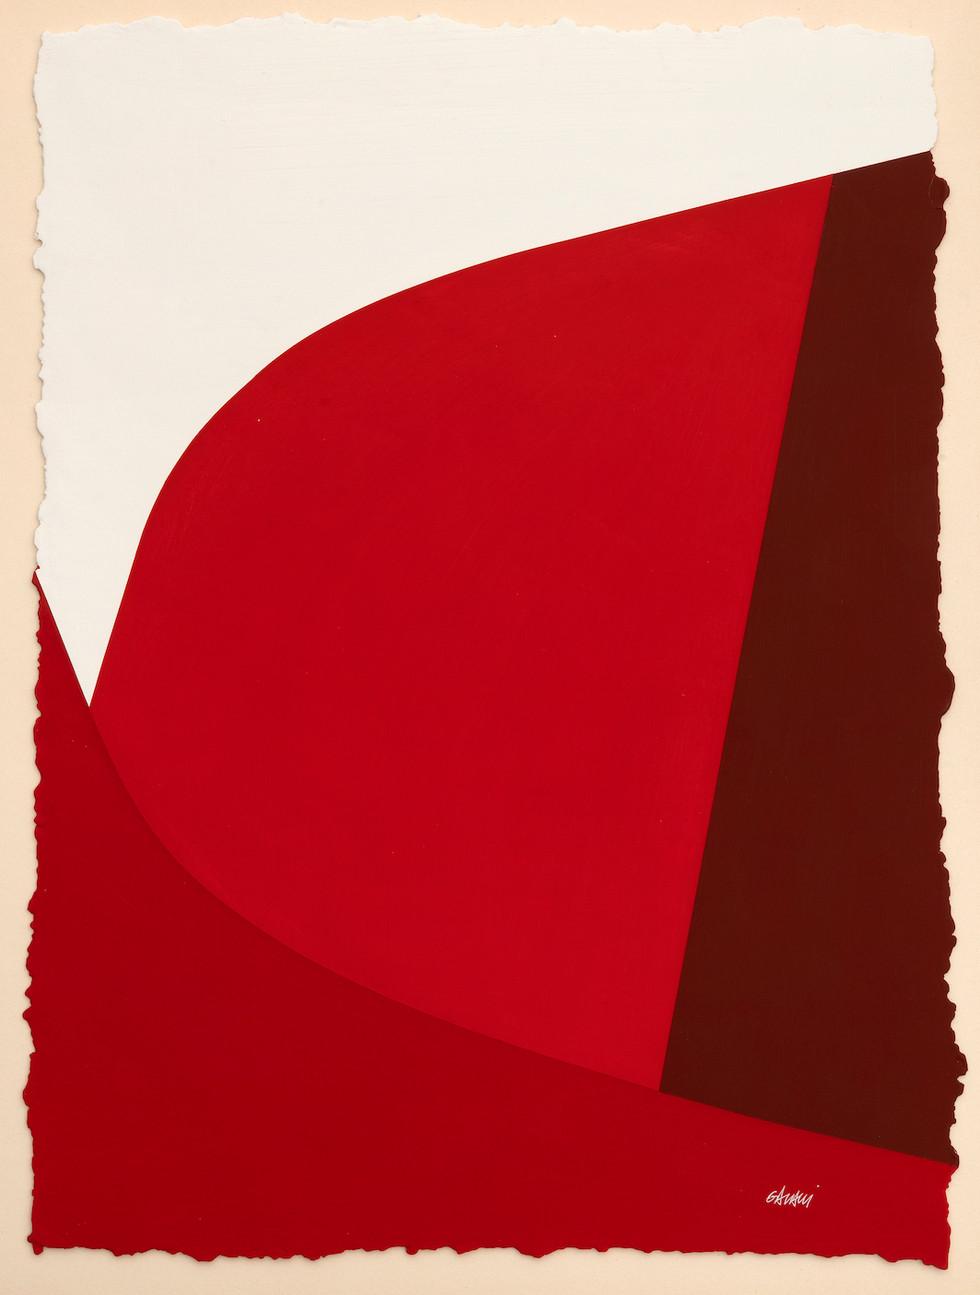 Lignes urbaines rouge 1 2019 Acryl auf handgeschöpftem Papier 52 x 38 cm